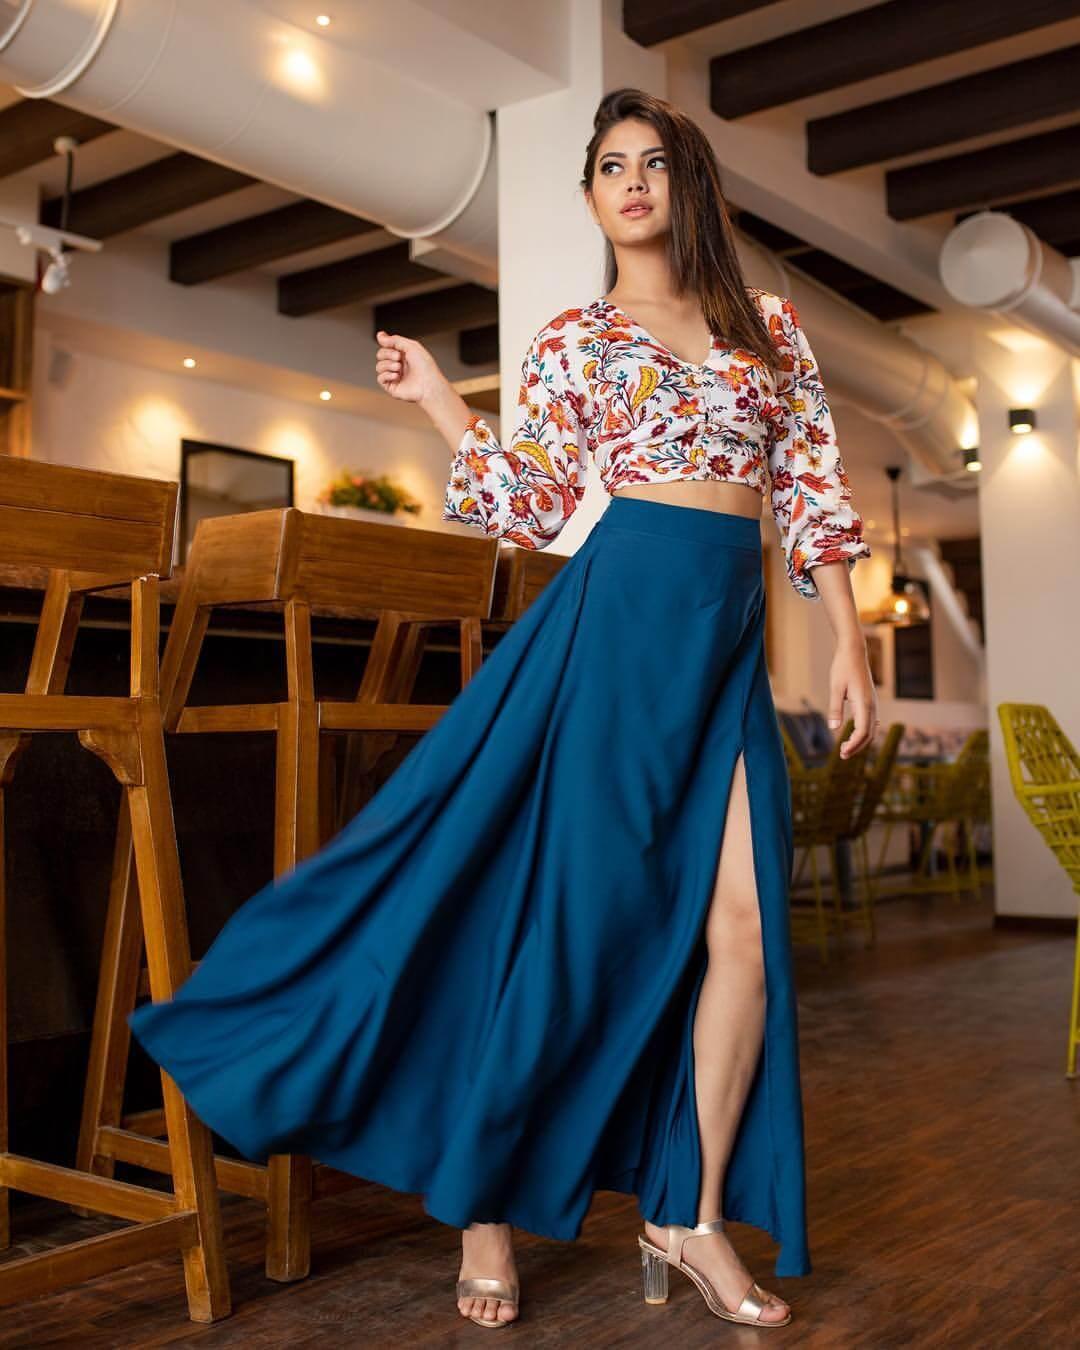 Indian Model Priyal Mahajan